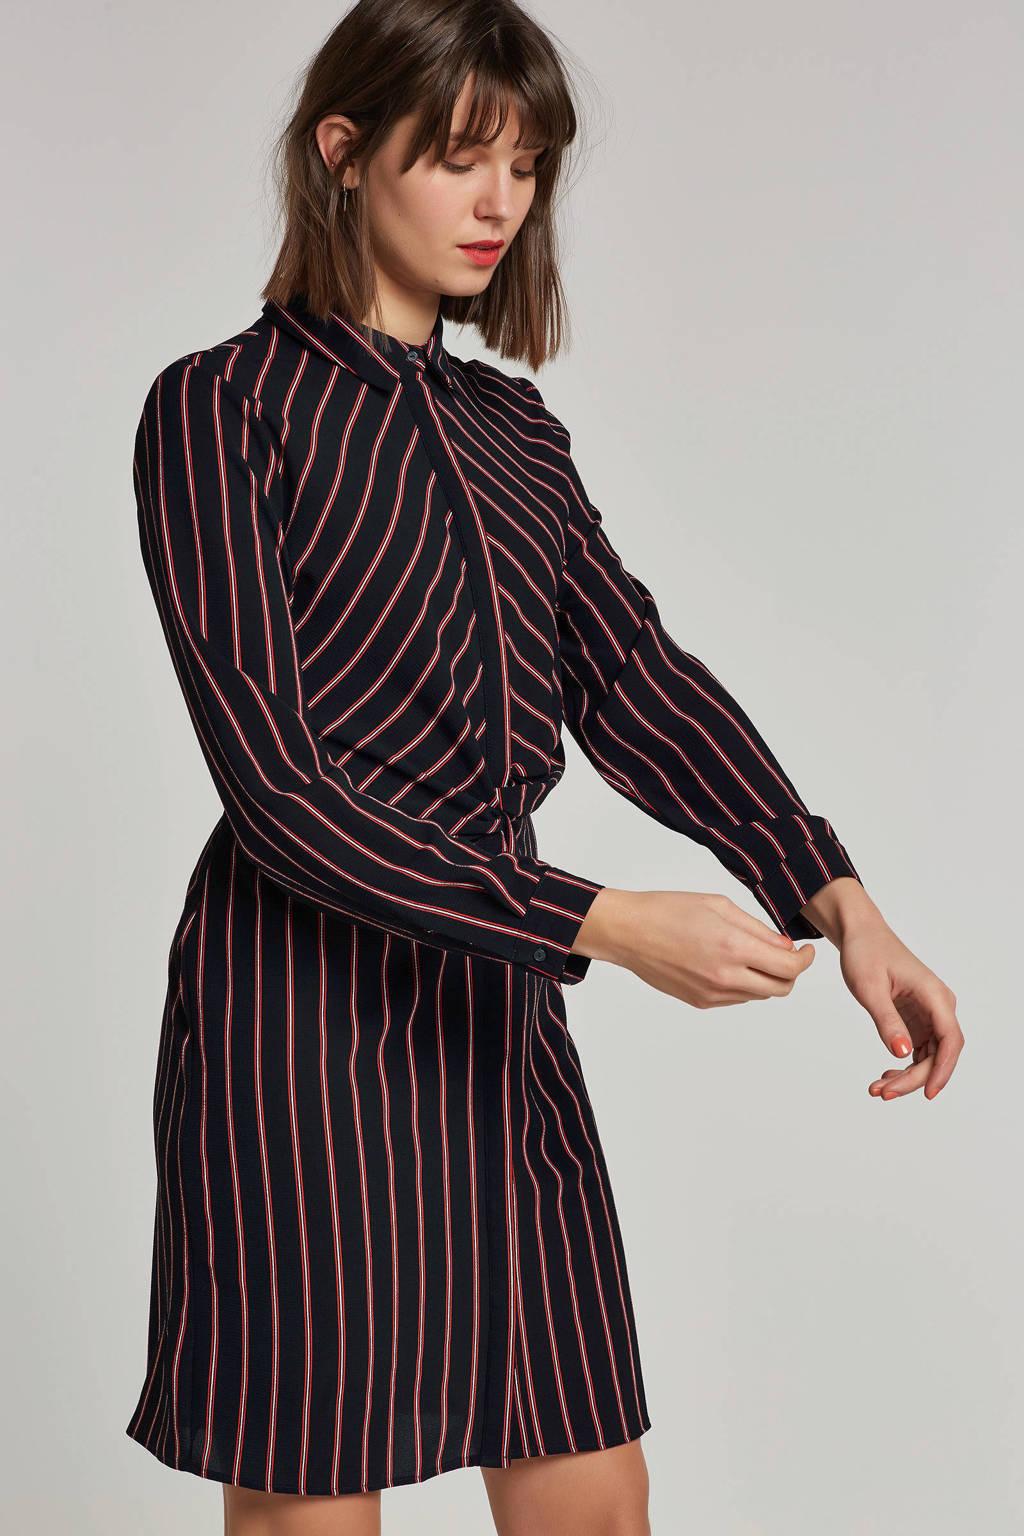 OBJECT gestreepte blousejurk, Donkerblauw/rood